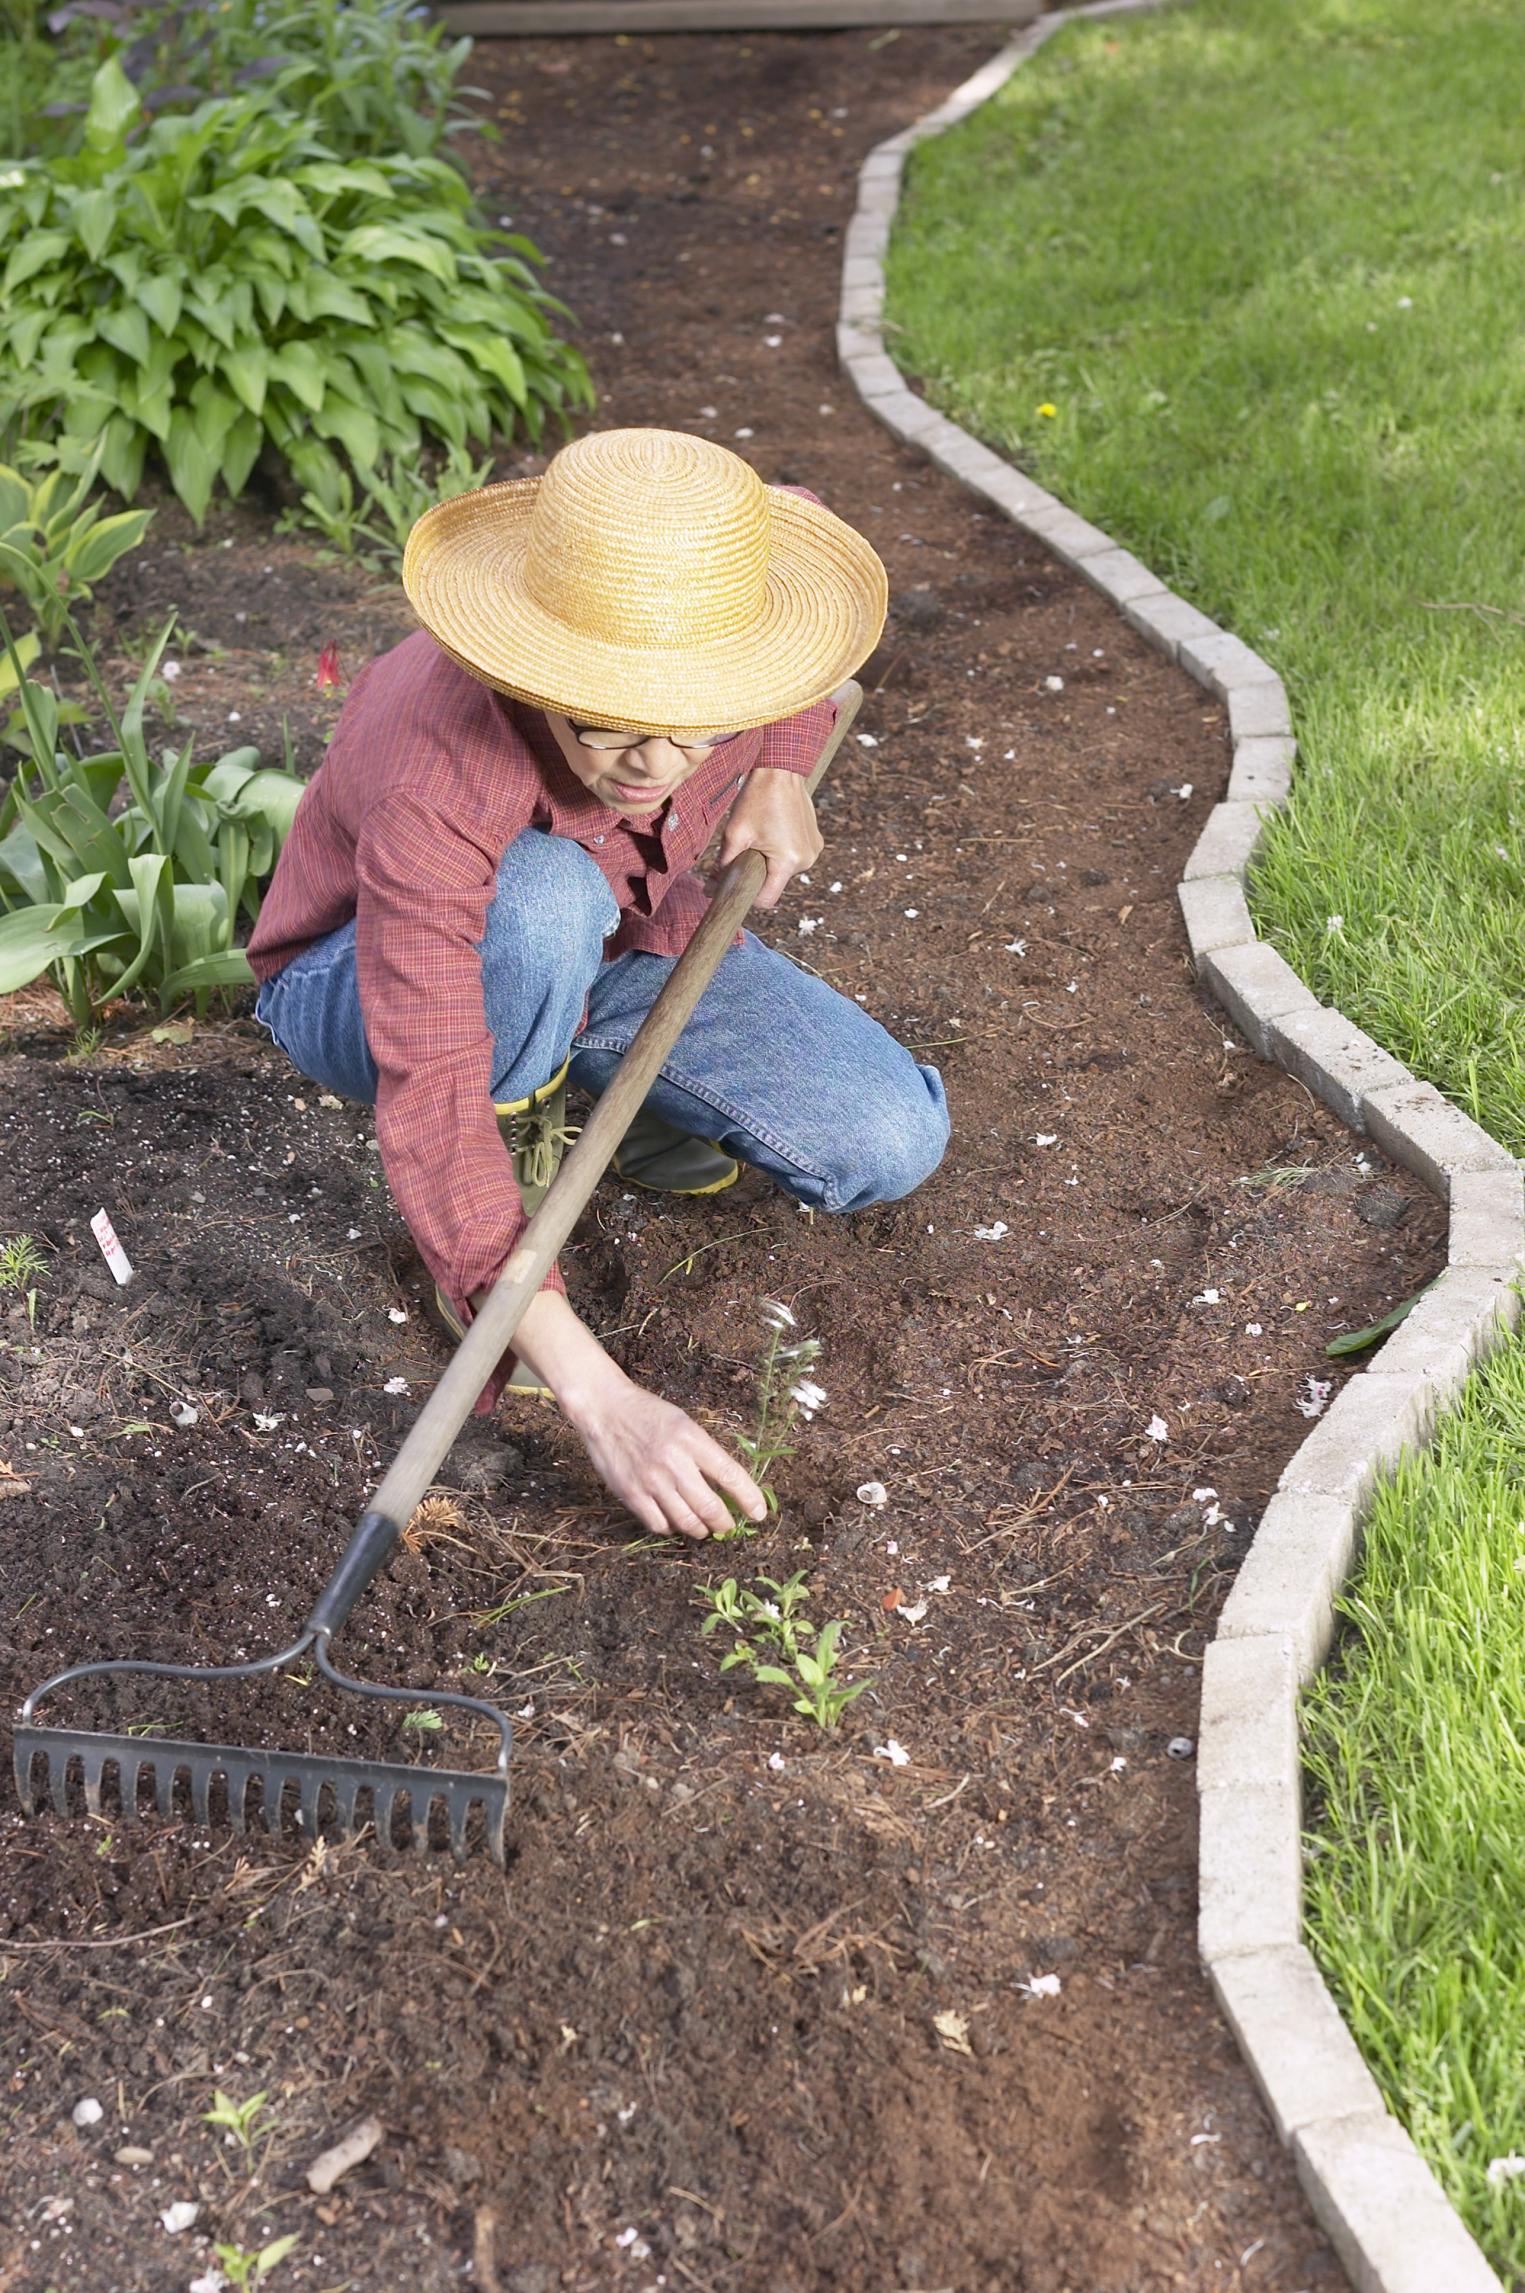 Stop weeds in flower beds - Stop Weeds In Flower Beds 53